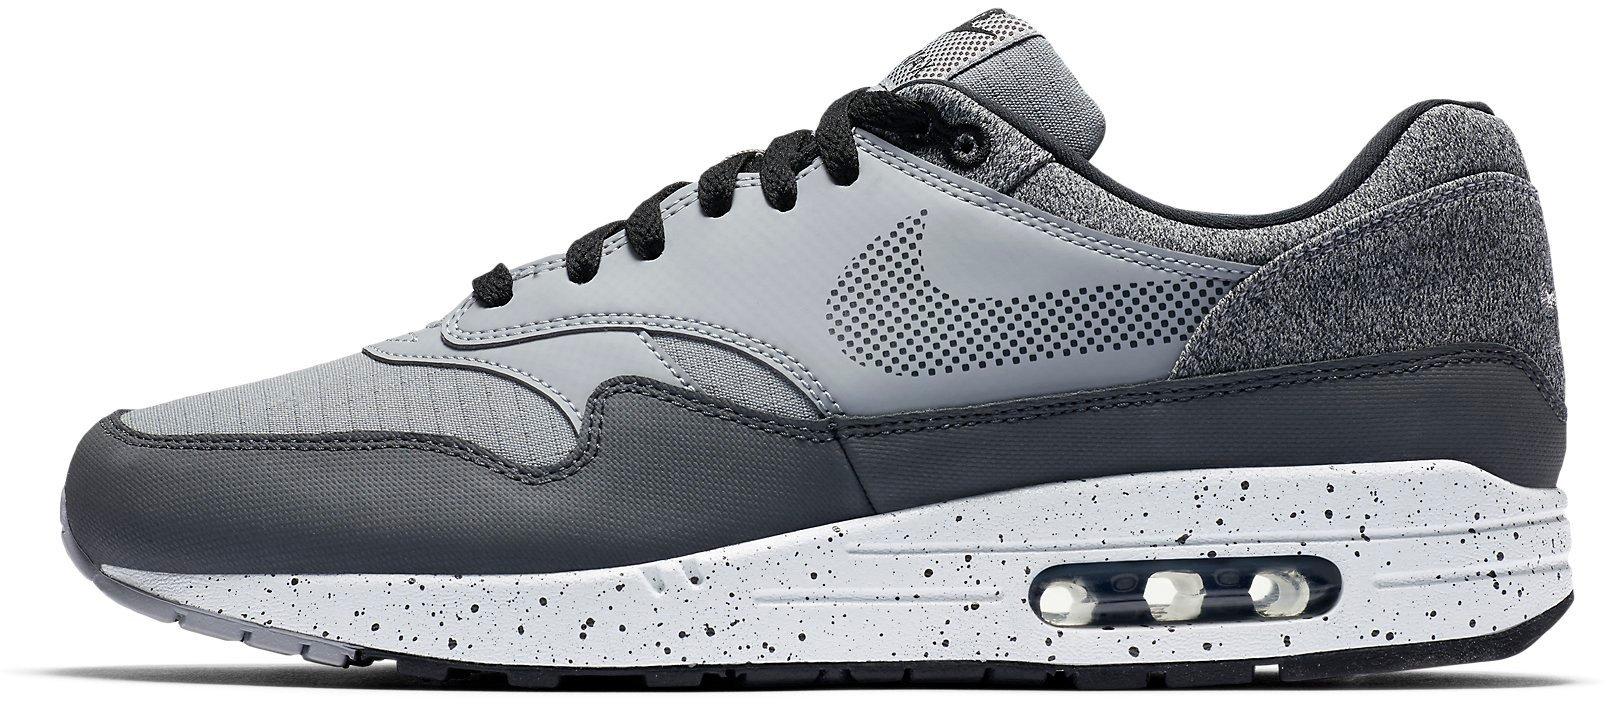 Shoes Nike AIR MAX 1 SE - Top4Football.com